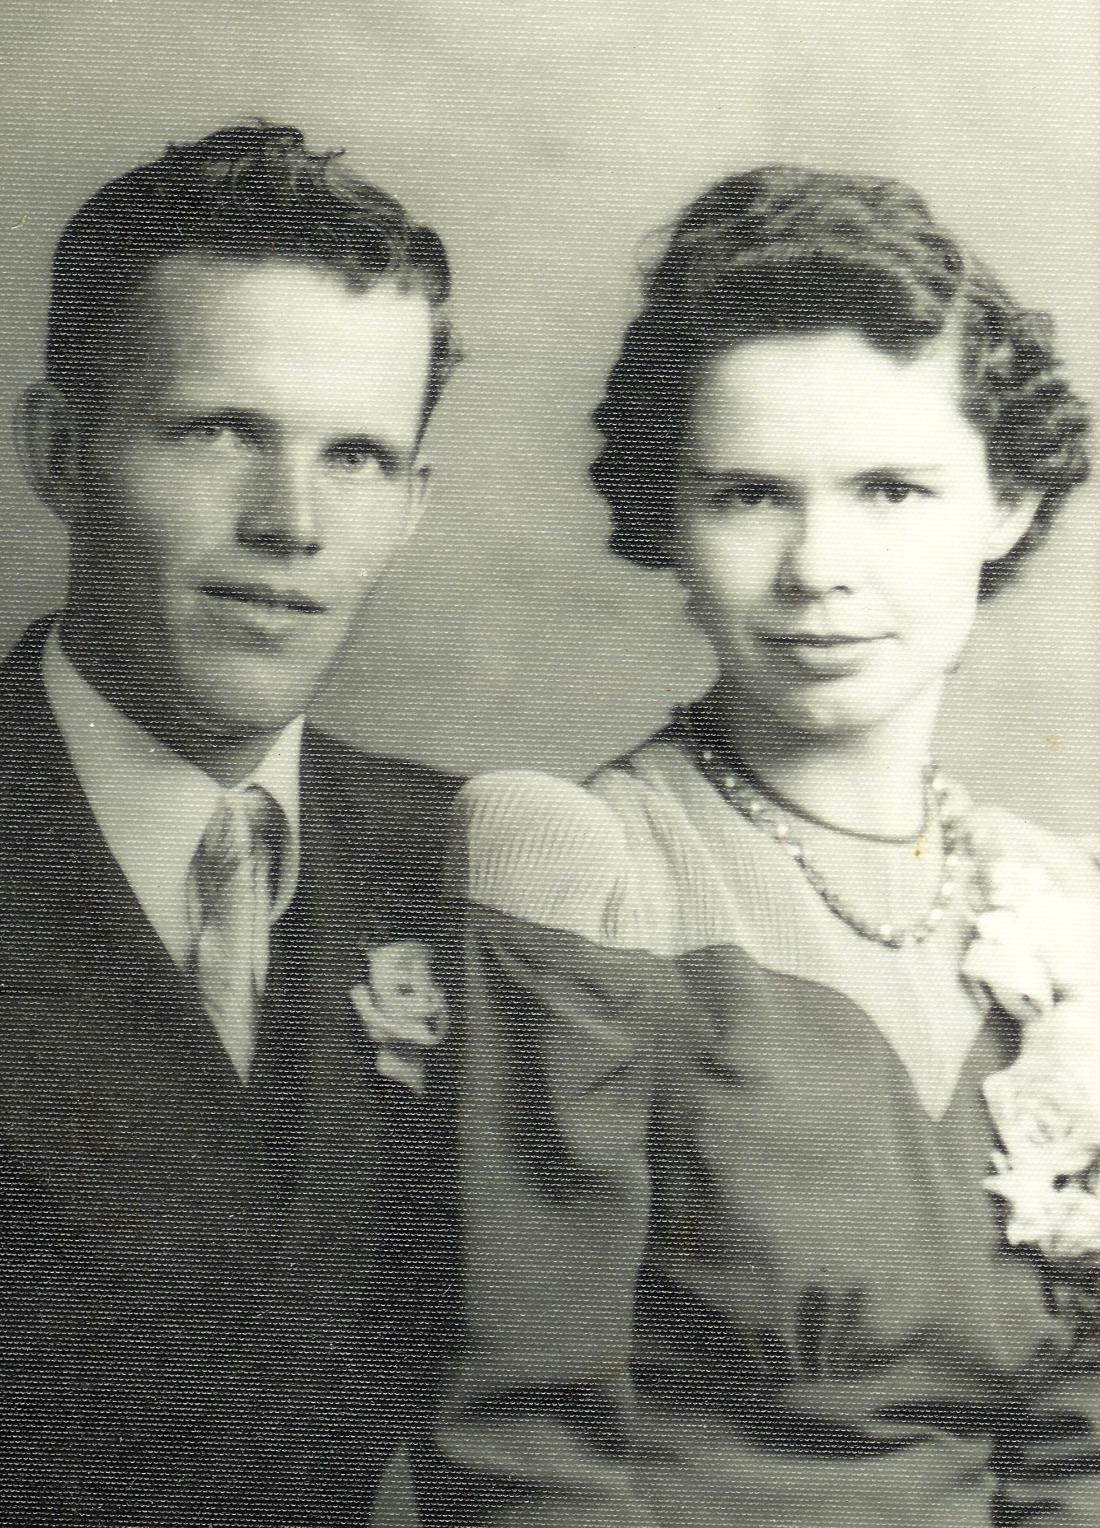 #21.1=Russell & Clarice Noorlun(Wedding Day, June 21st, '41)